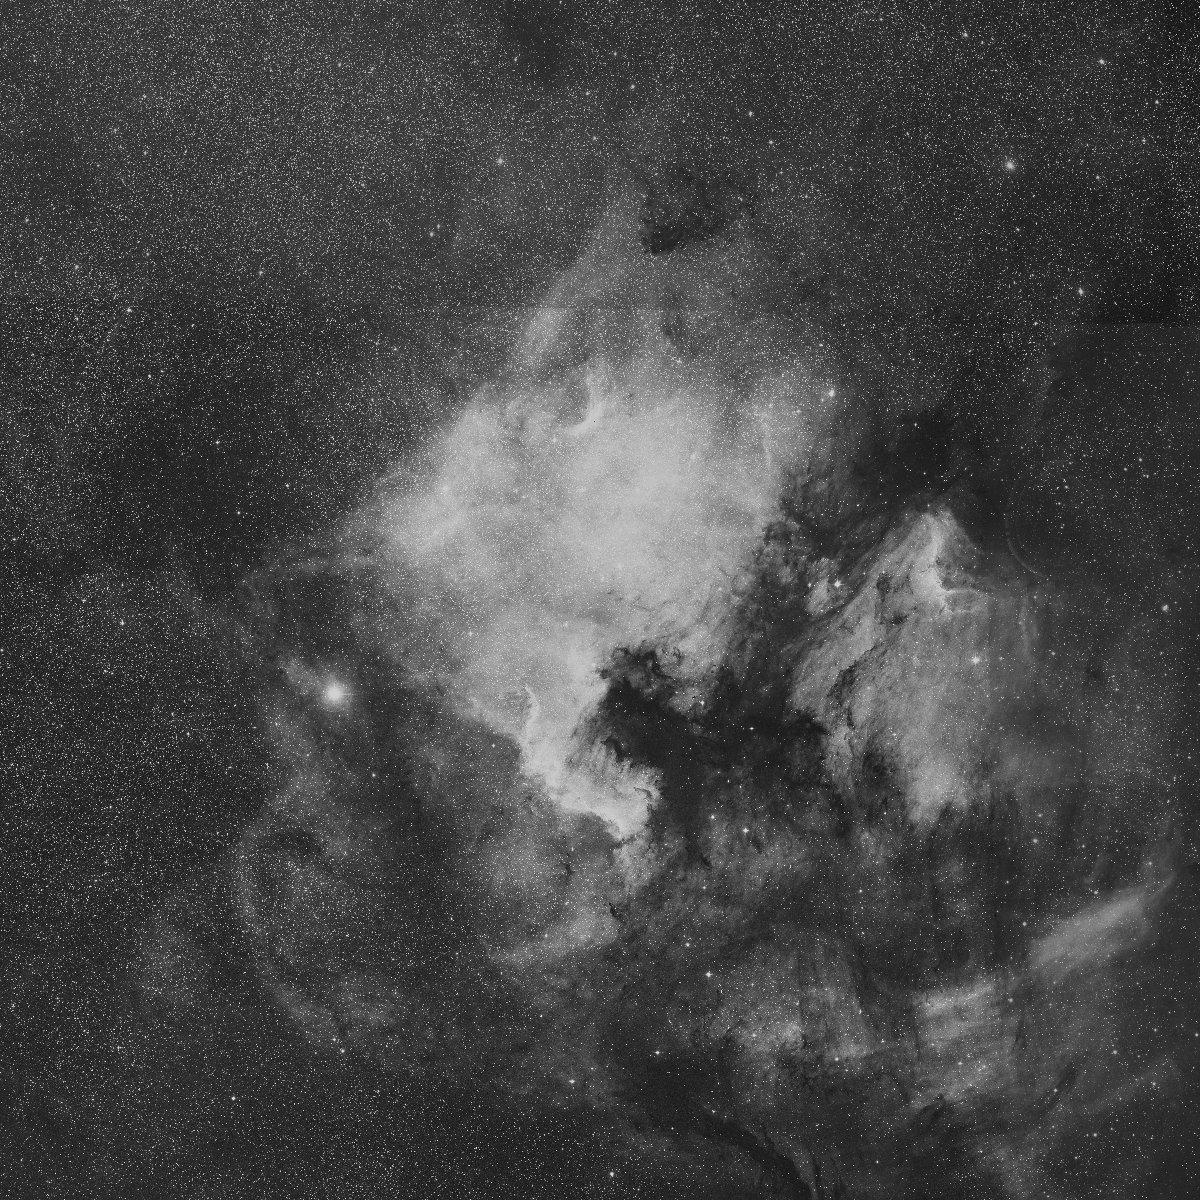 NGC7000_skyview.jpg